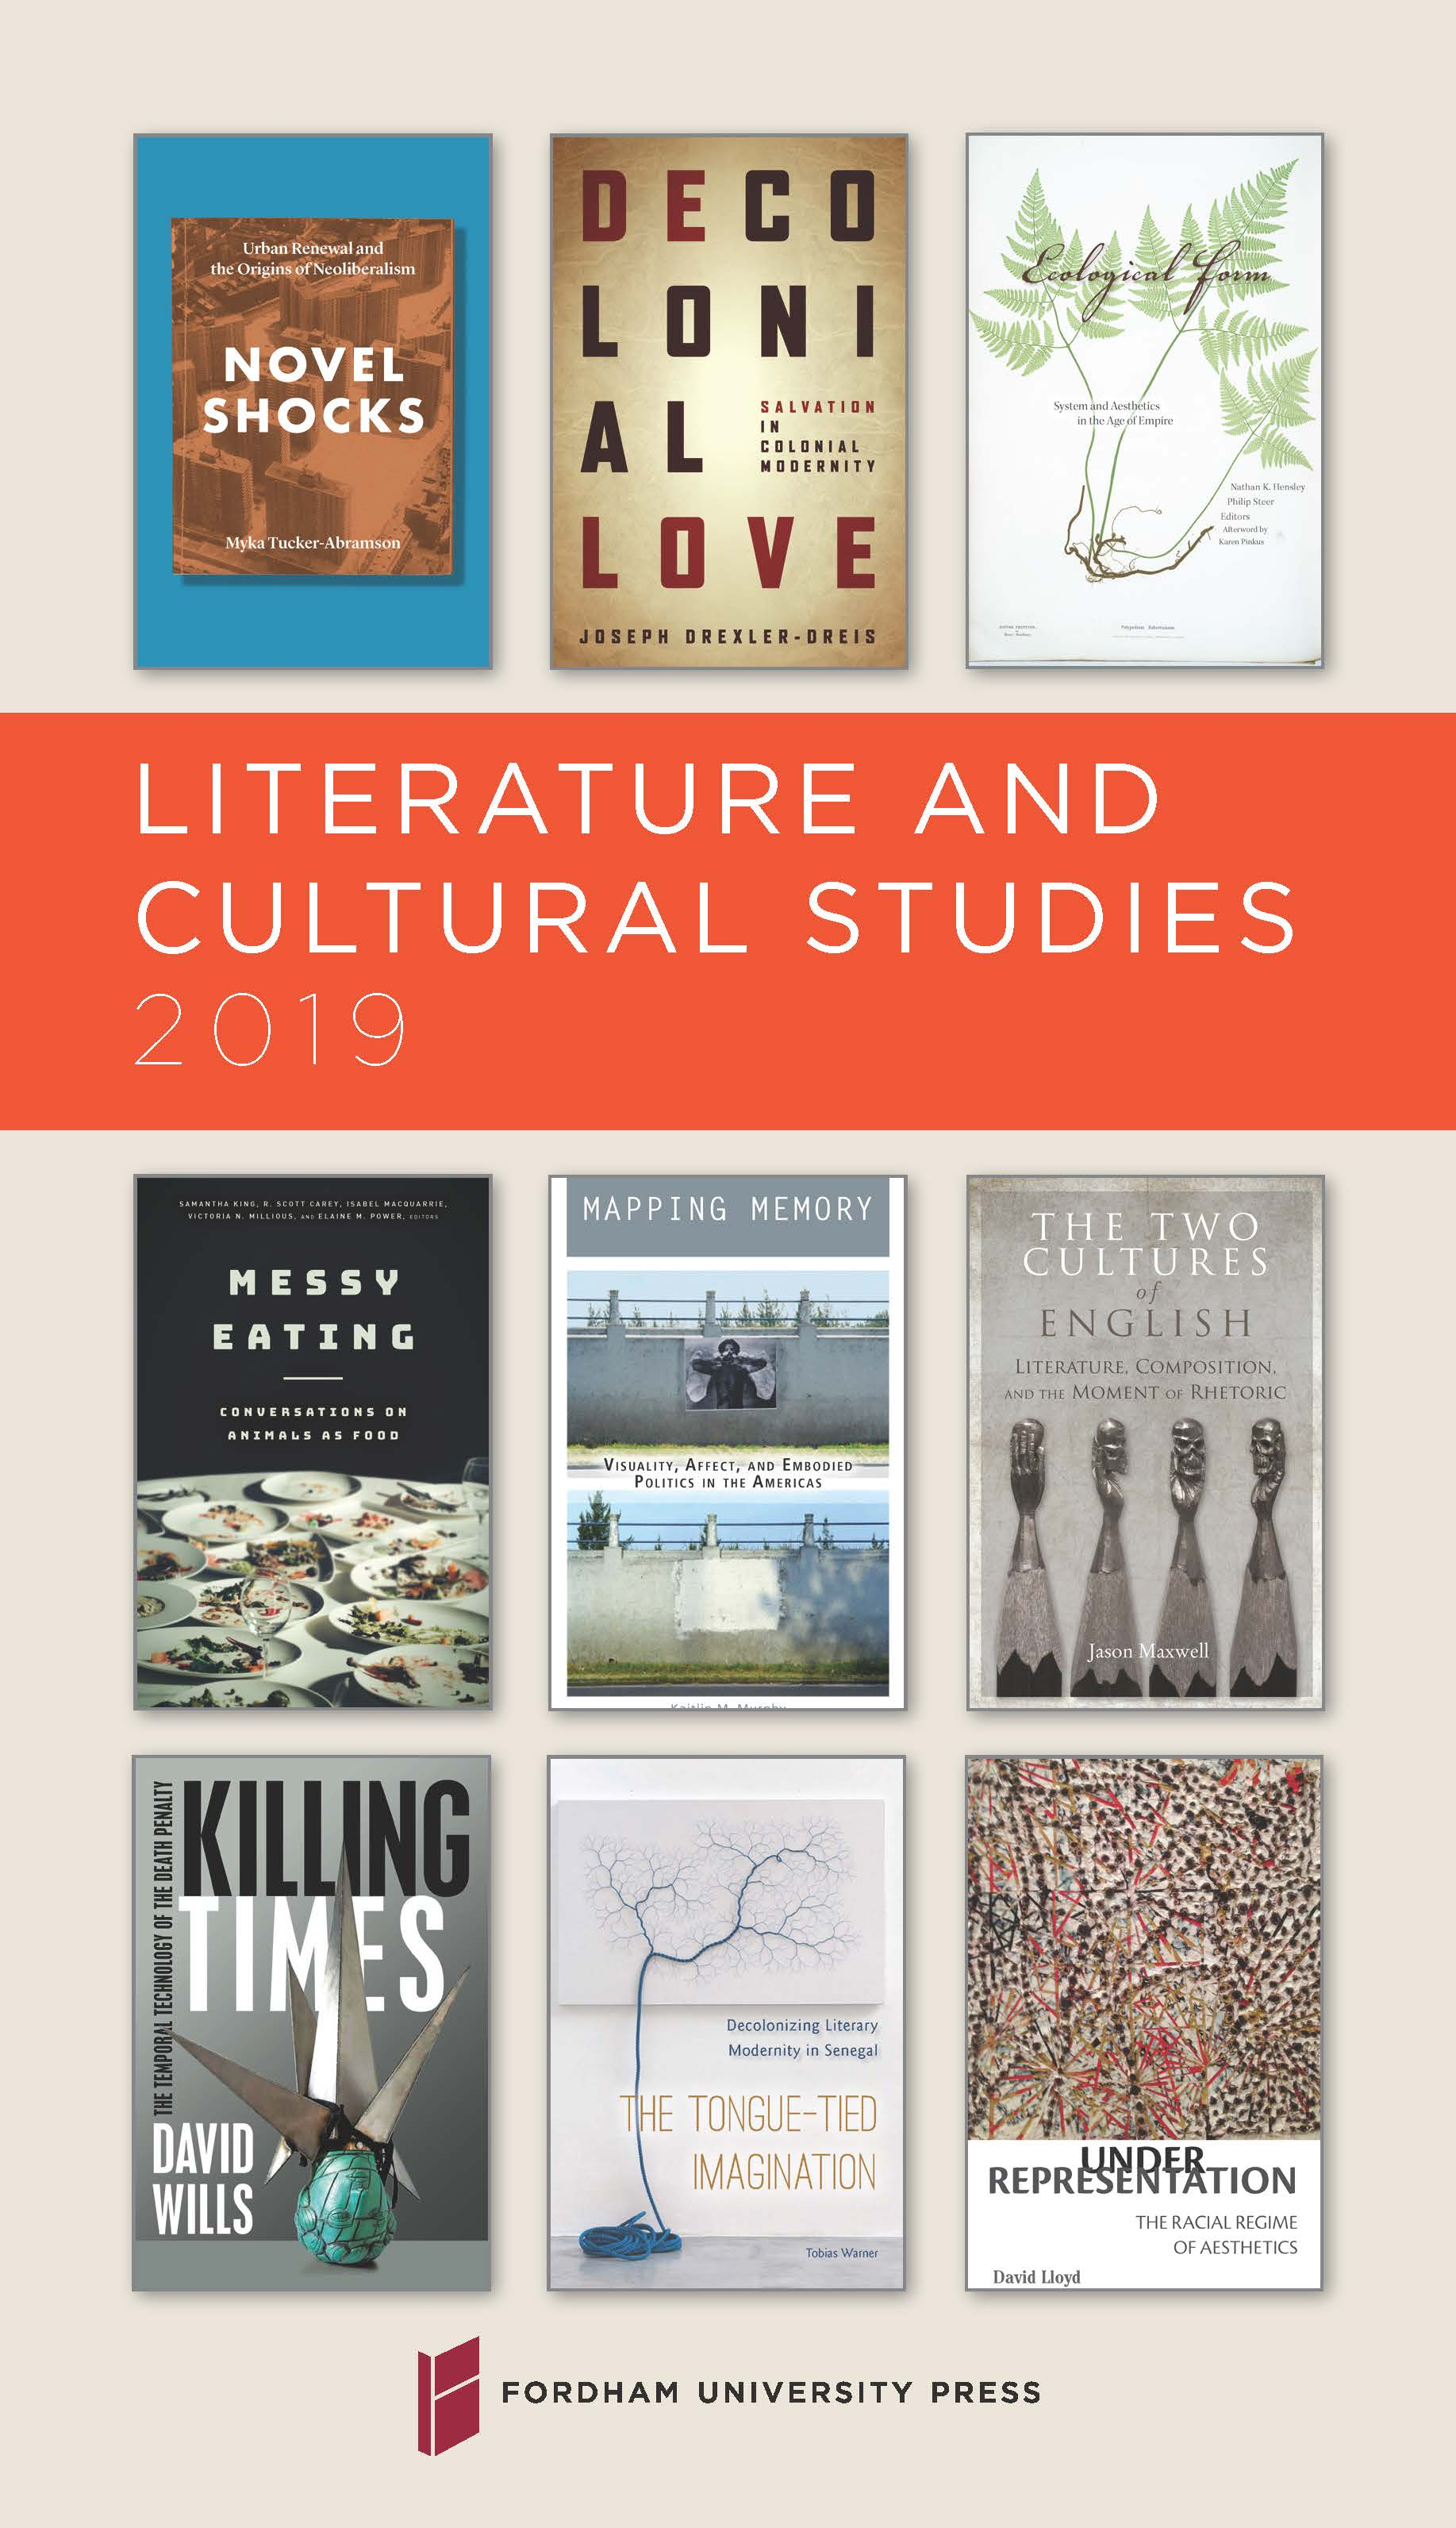 Literature and Cultural Studies 2019